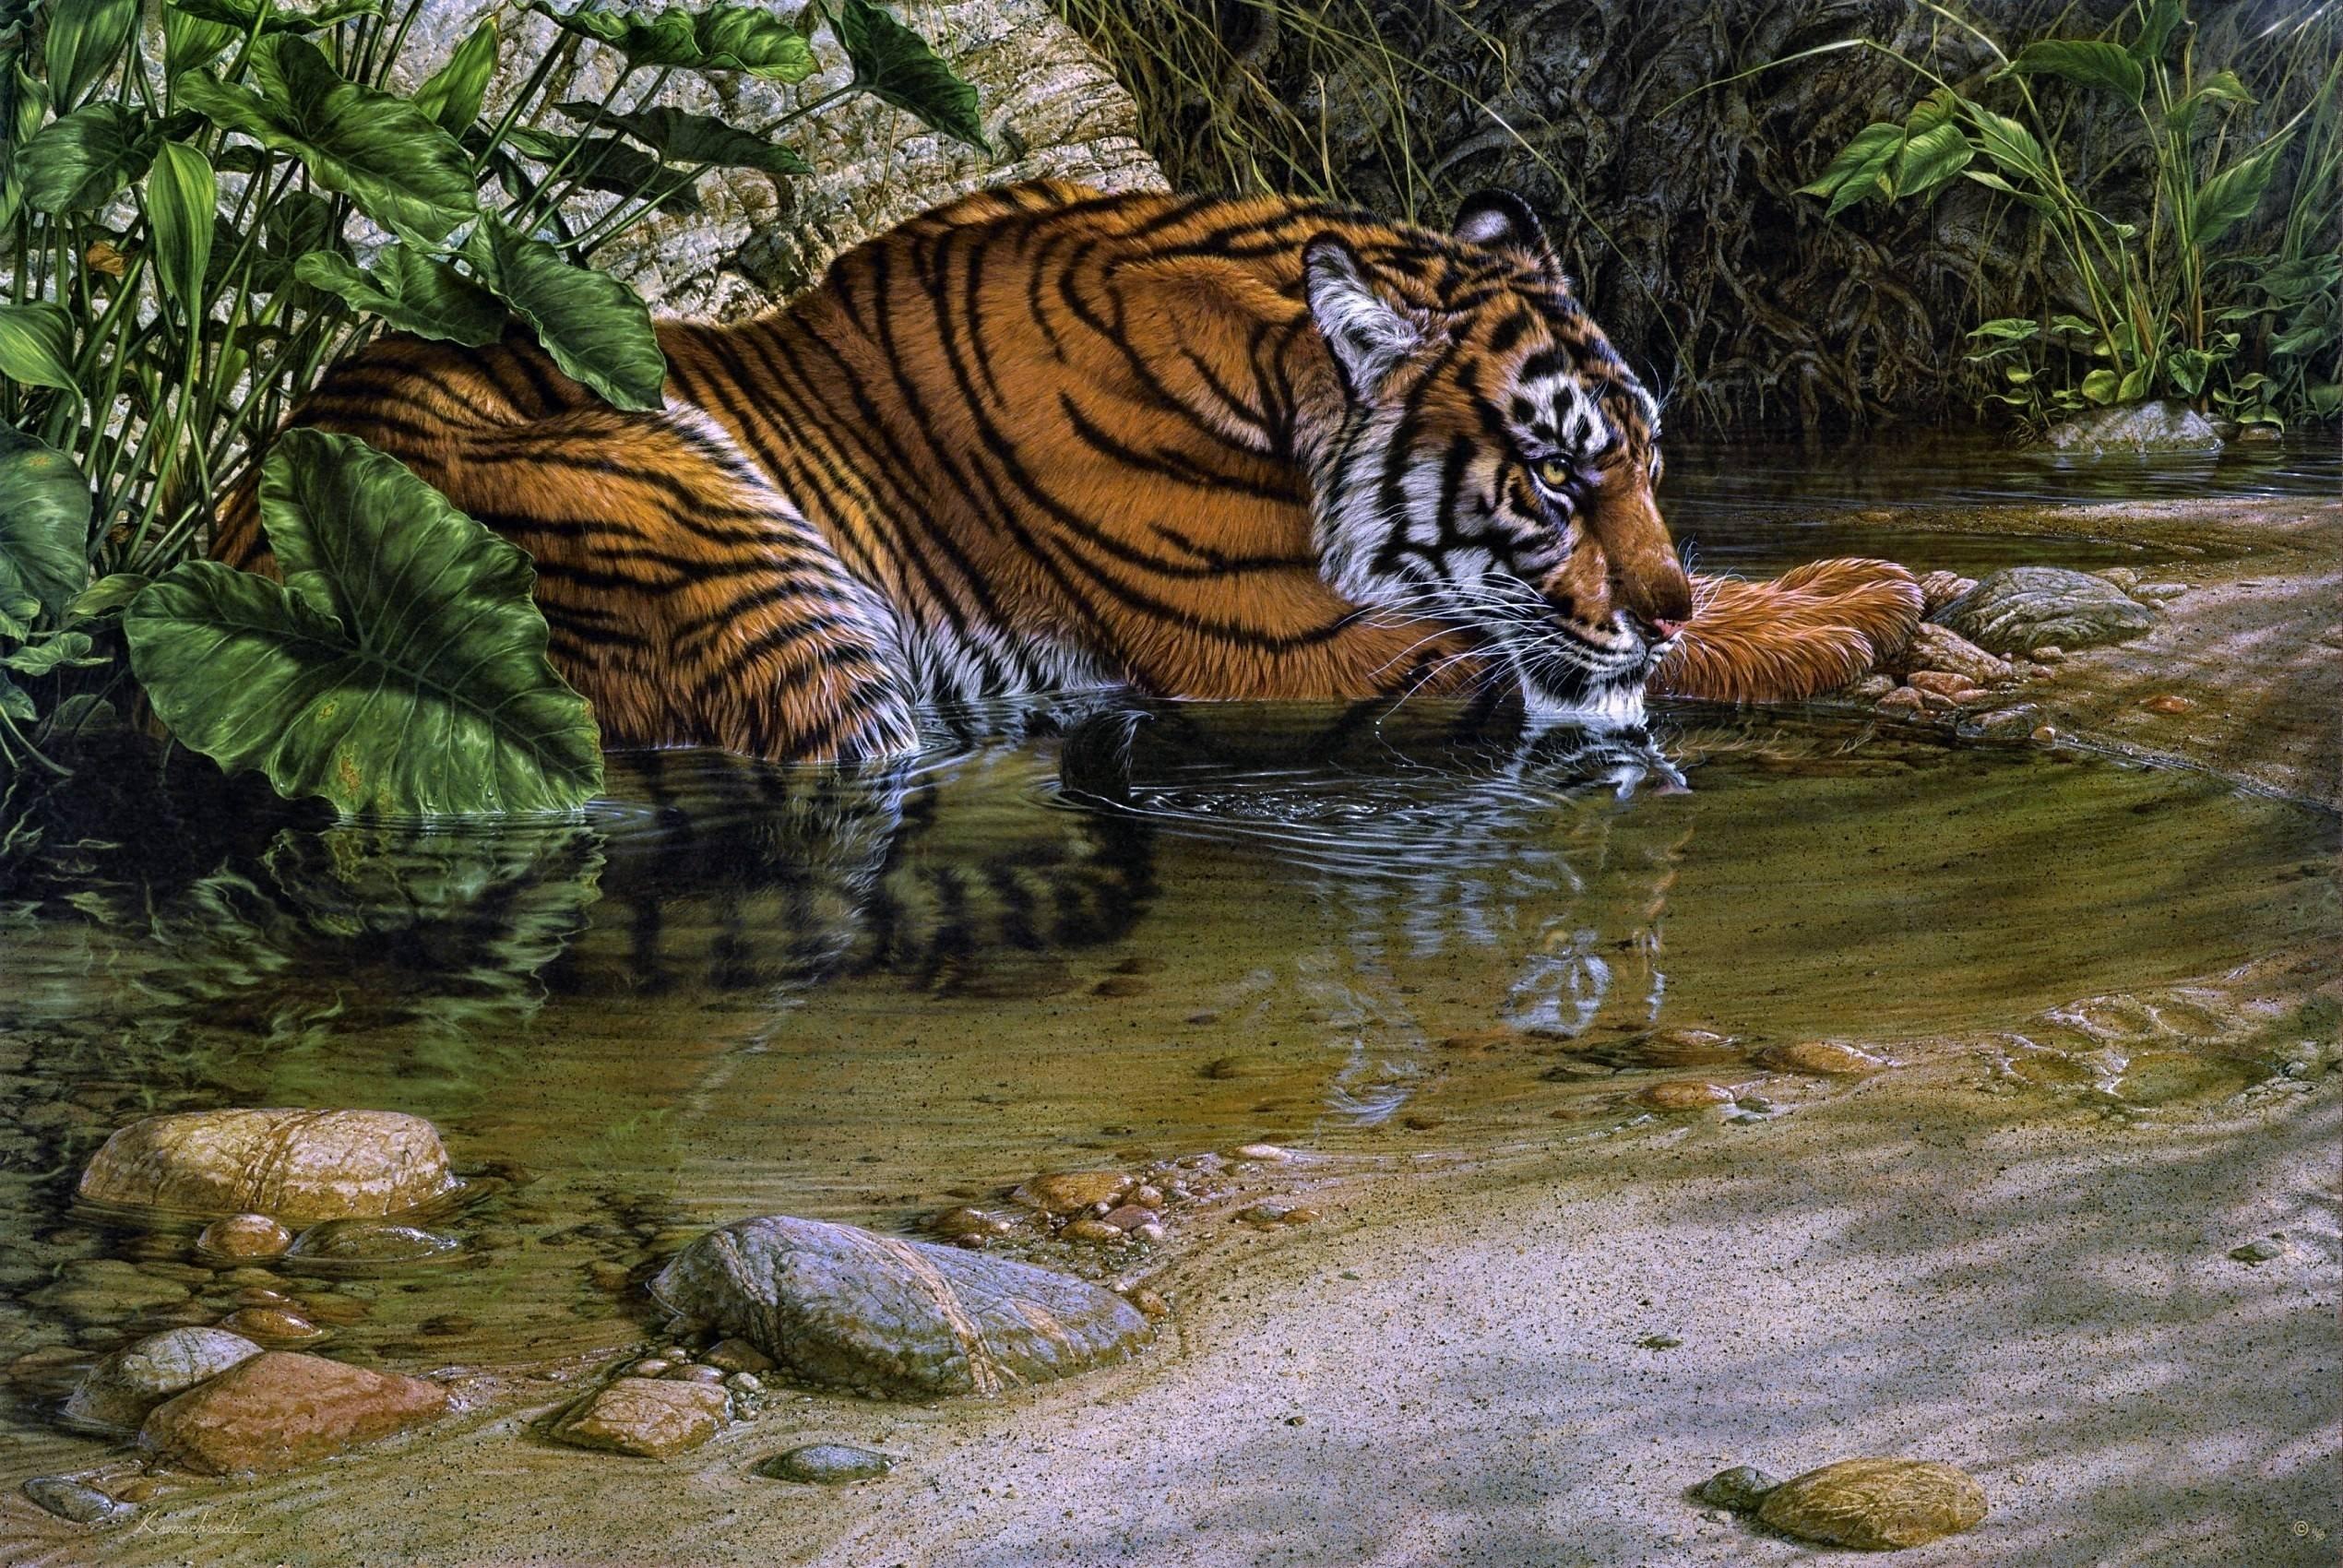 Tigre-jungla-animales-pintura-agua-selva wallpaper ...